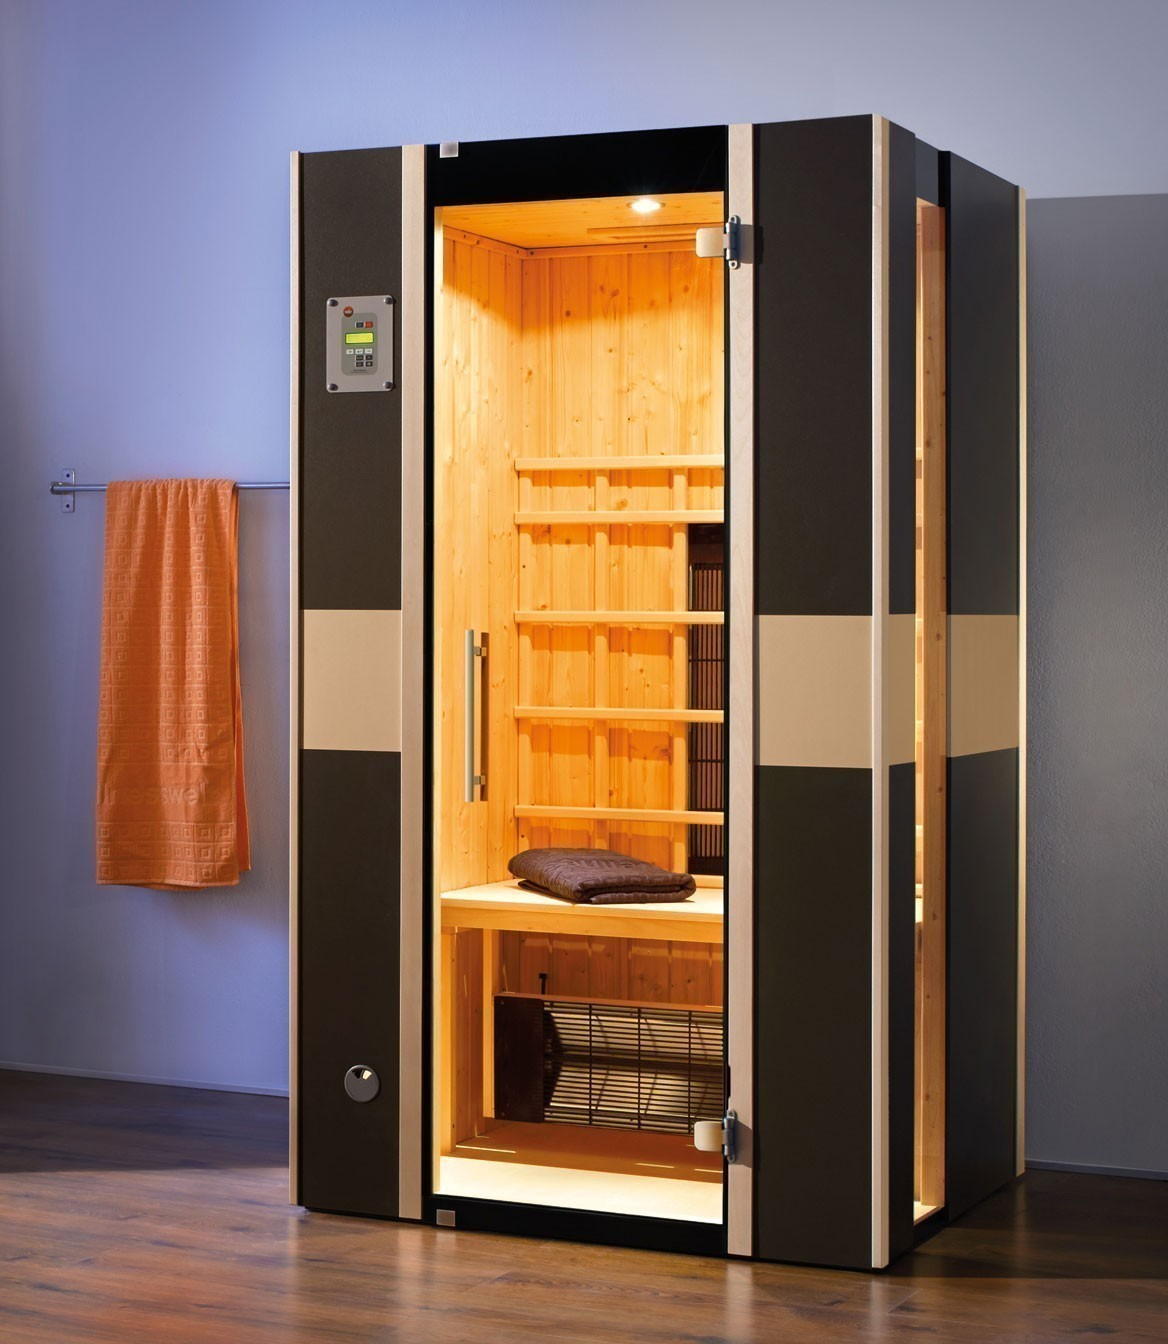 weka w rmekabine infrarotkabine 543 gr 1 graphit keramikstrahler bei. Black Bedroom Furniture Sets. Home Design Ideas